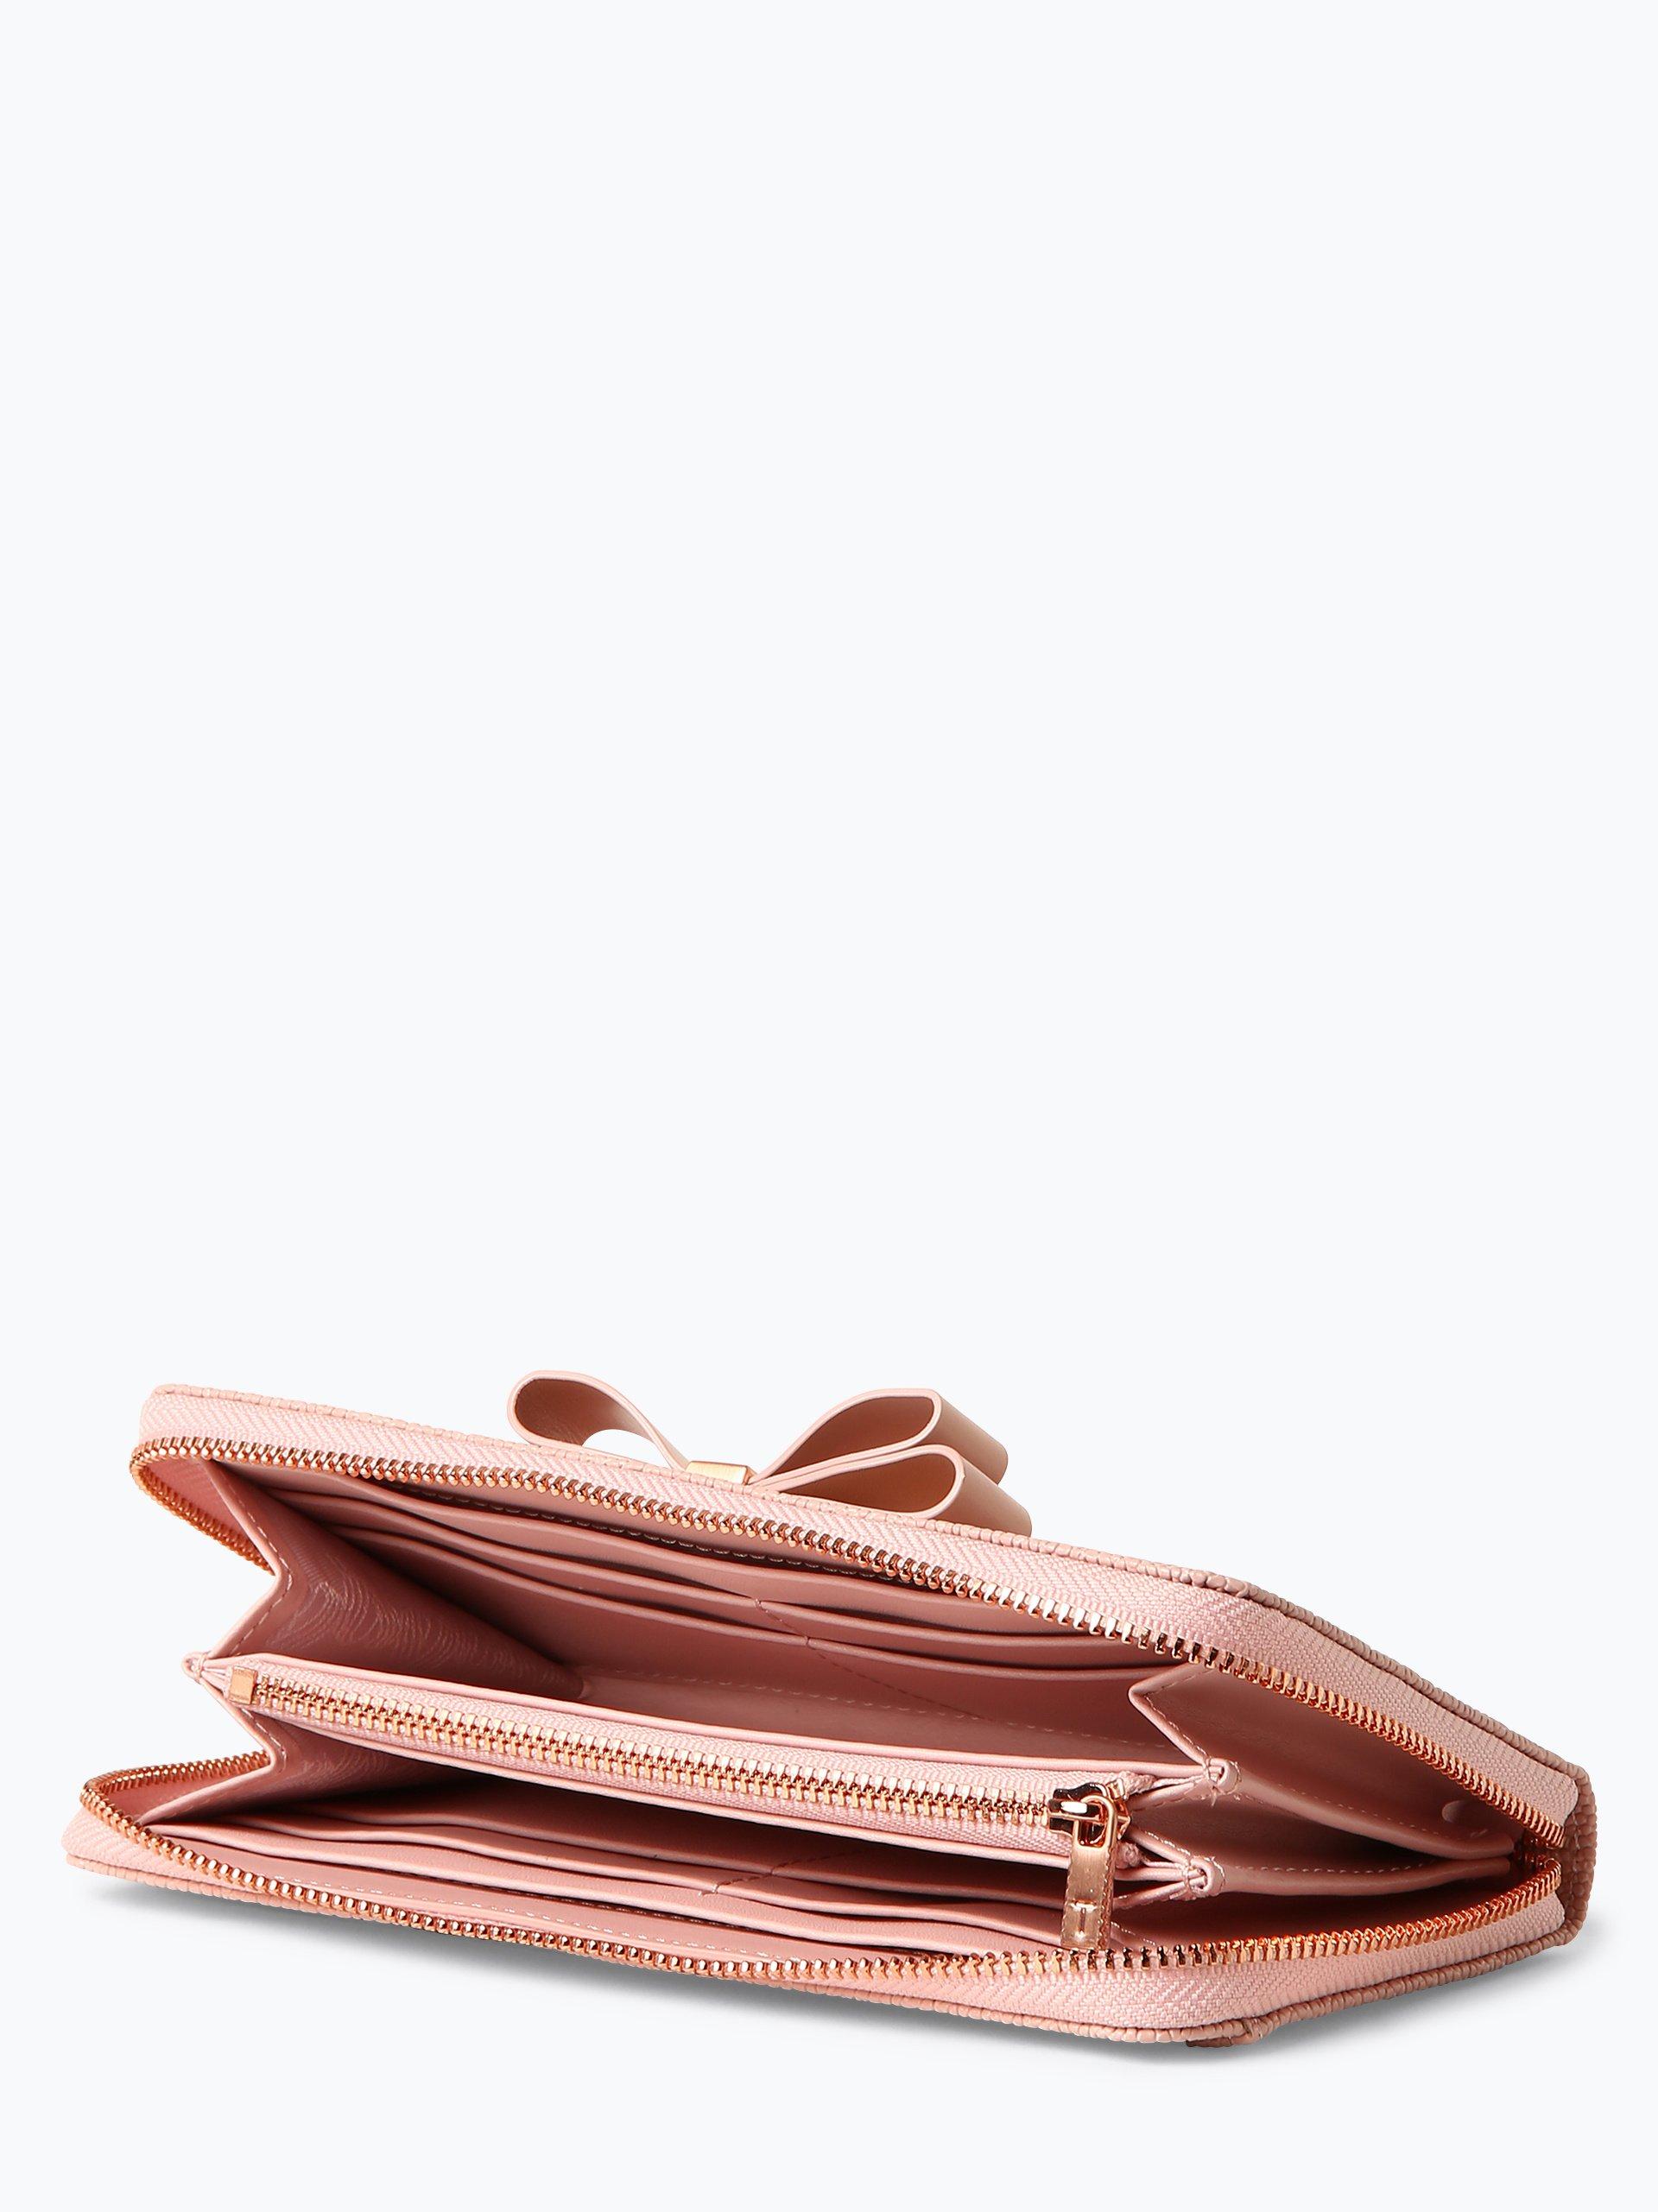 Ted Baker Damen Geldbörse aus Leder